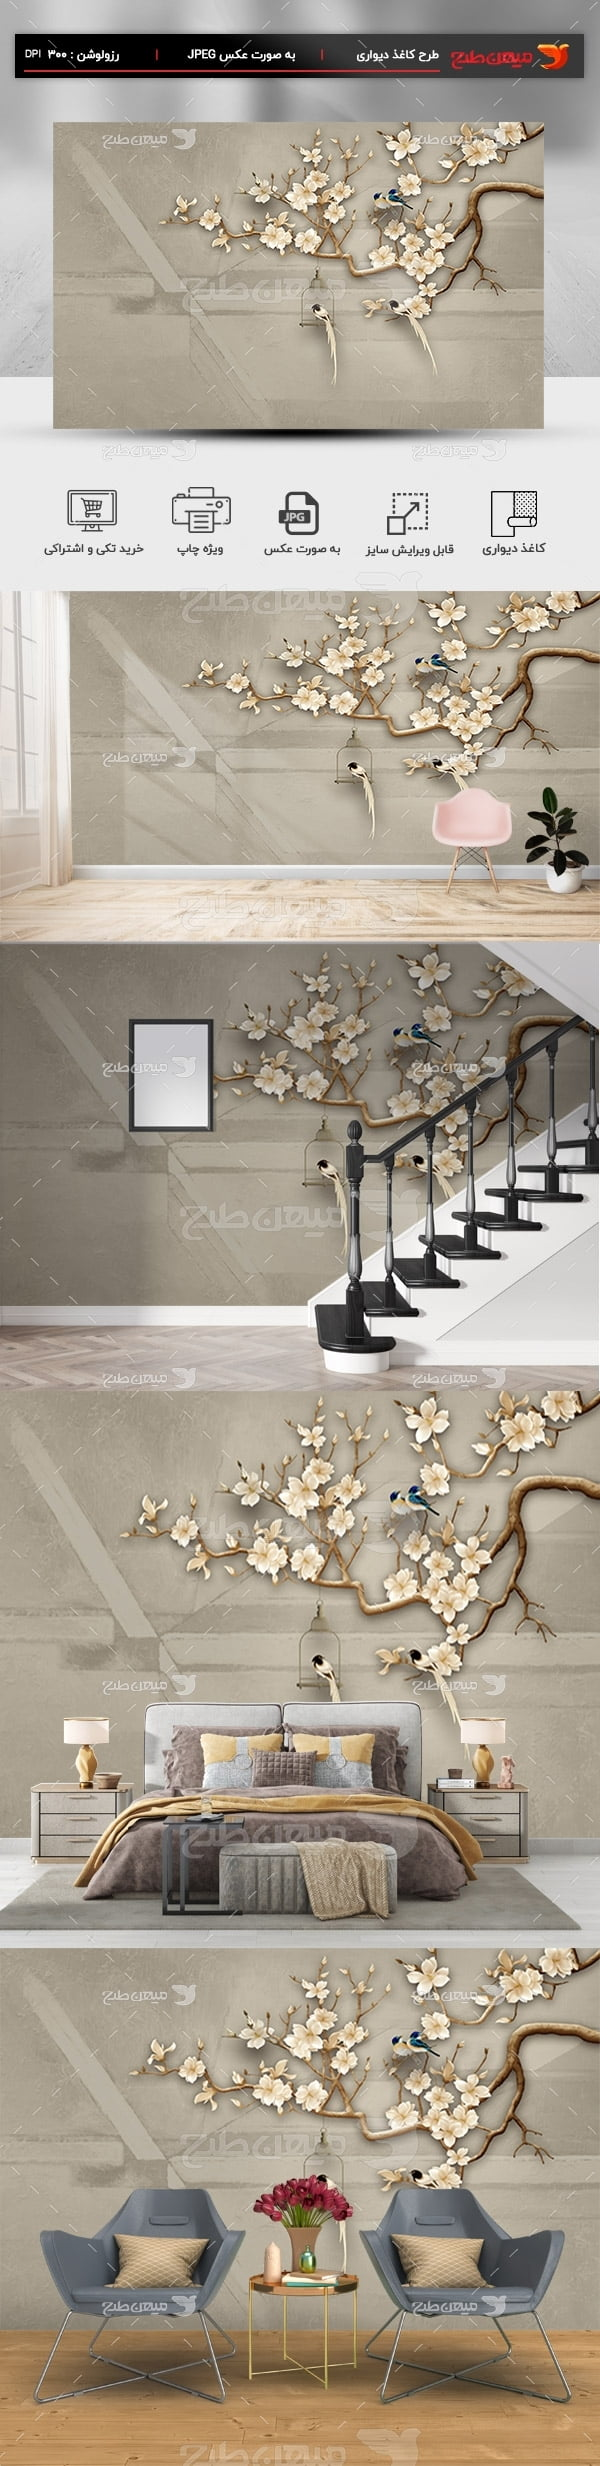 پوستر کاغذ دیواری سه بعدی طرح گل و پرنده